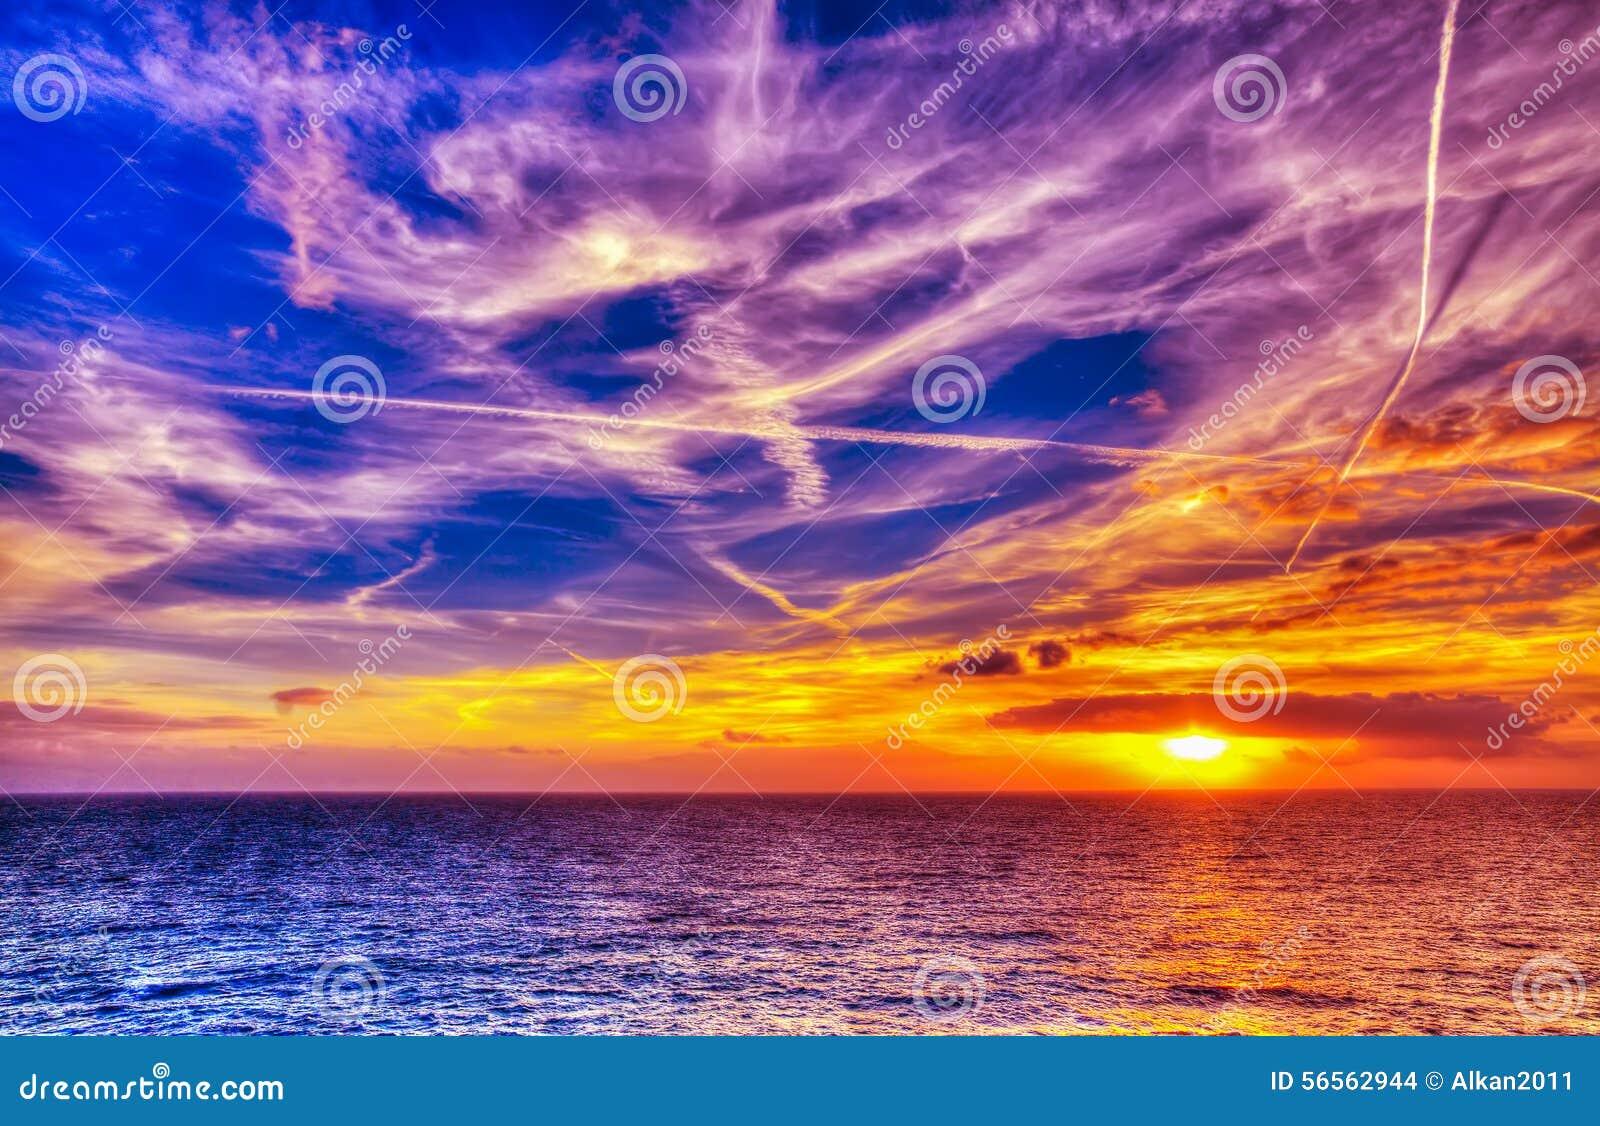 Download Φωτεινός ήλιος και άσπρα σύννεφα πέρα από τη θάλασσα στην ακτή Alghero Στοκ Εικόνες - εικόνα από azov, περιοχής: 56562944